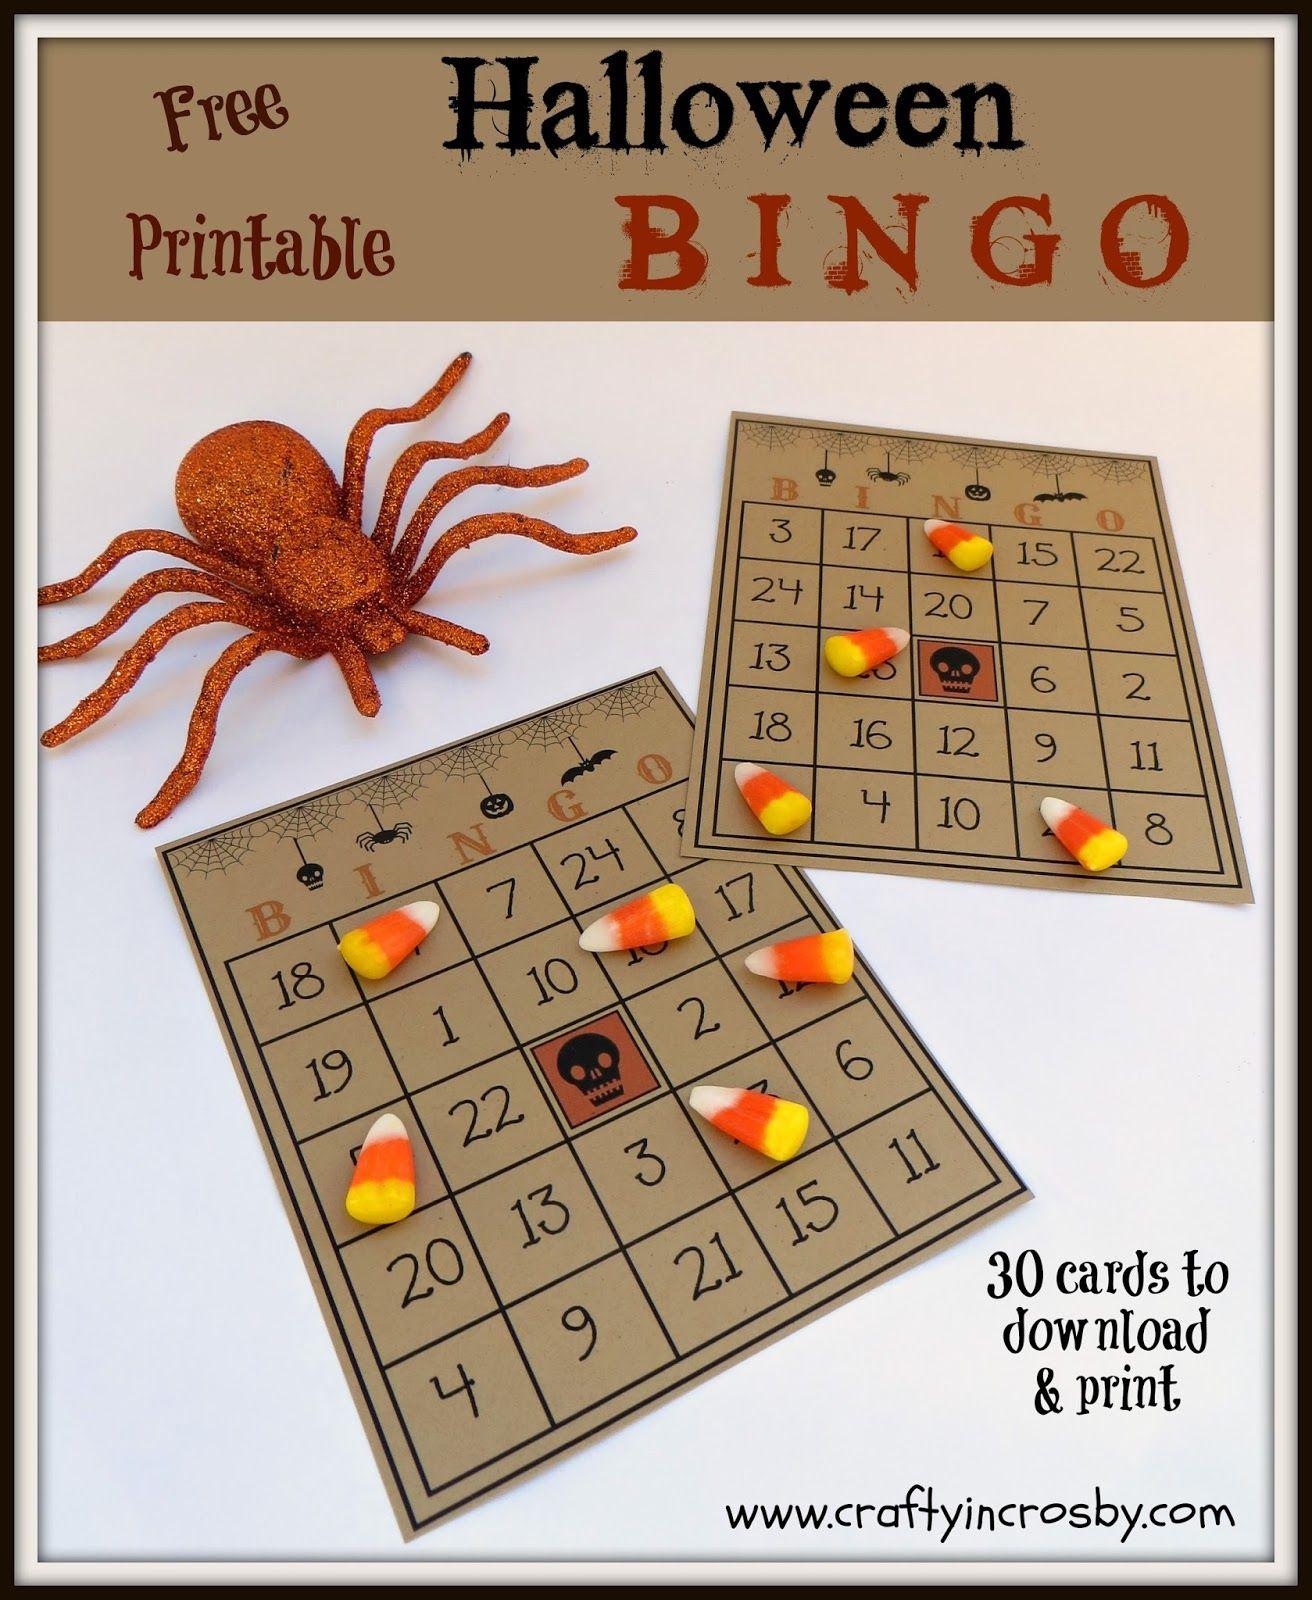 Free Printable Halloween Bingo Game With 30 Cards Call Sheet And